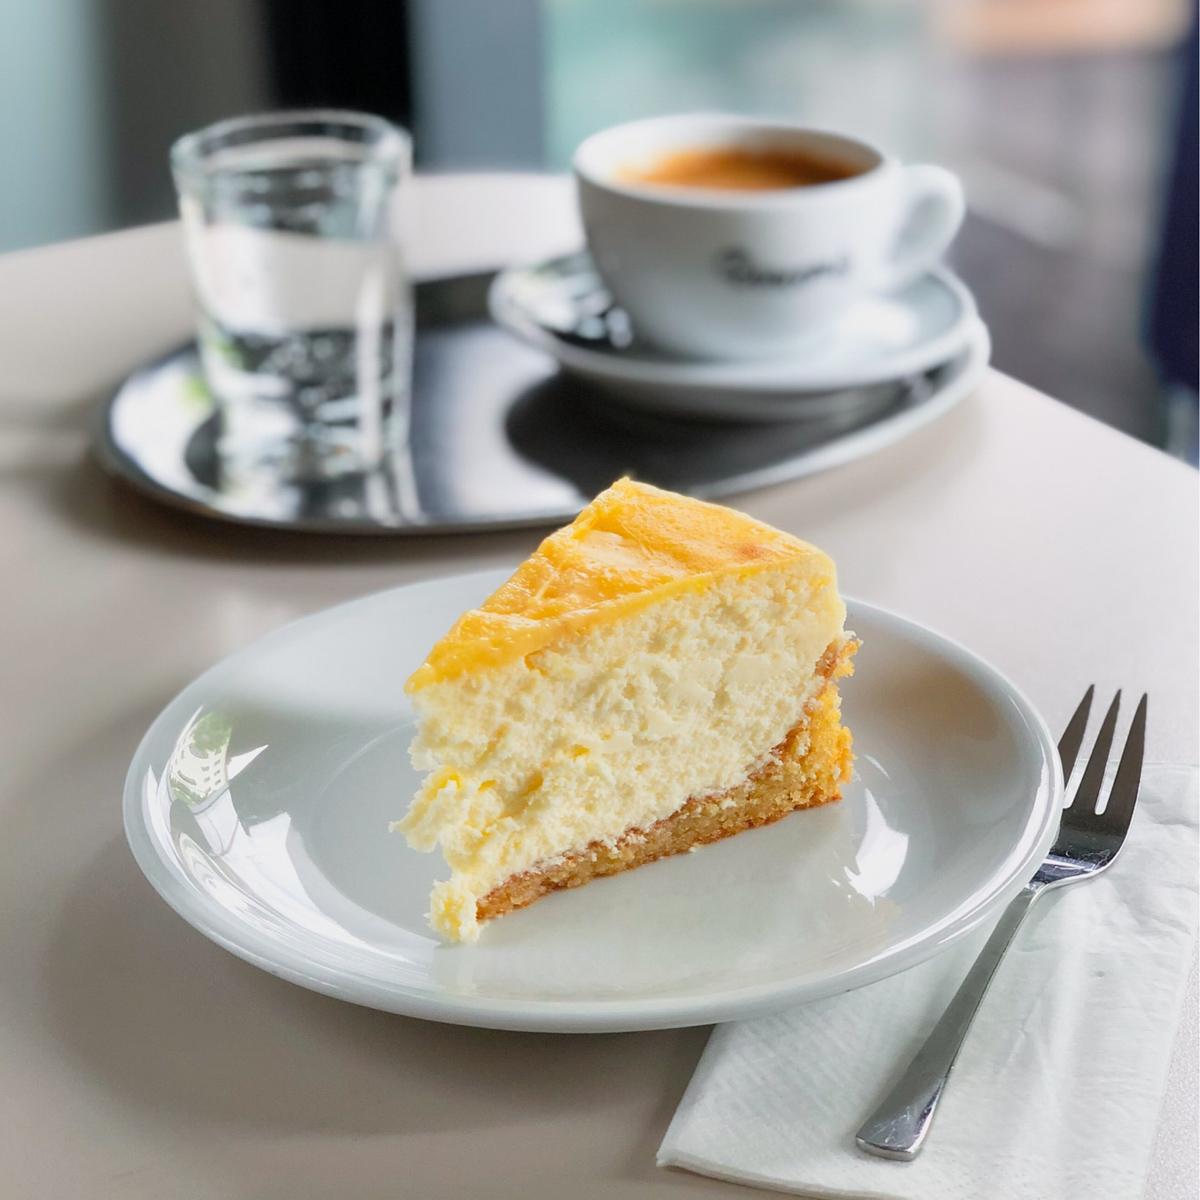 Barcomis Café und Kaffeerösterei Kreuzberg-4